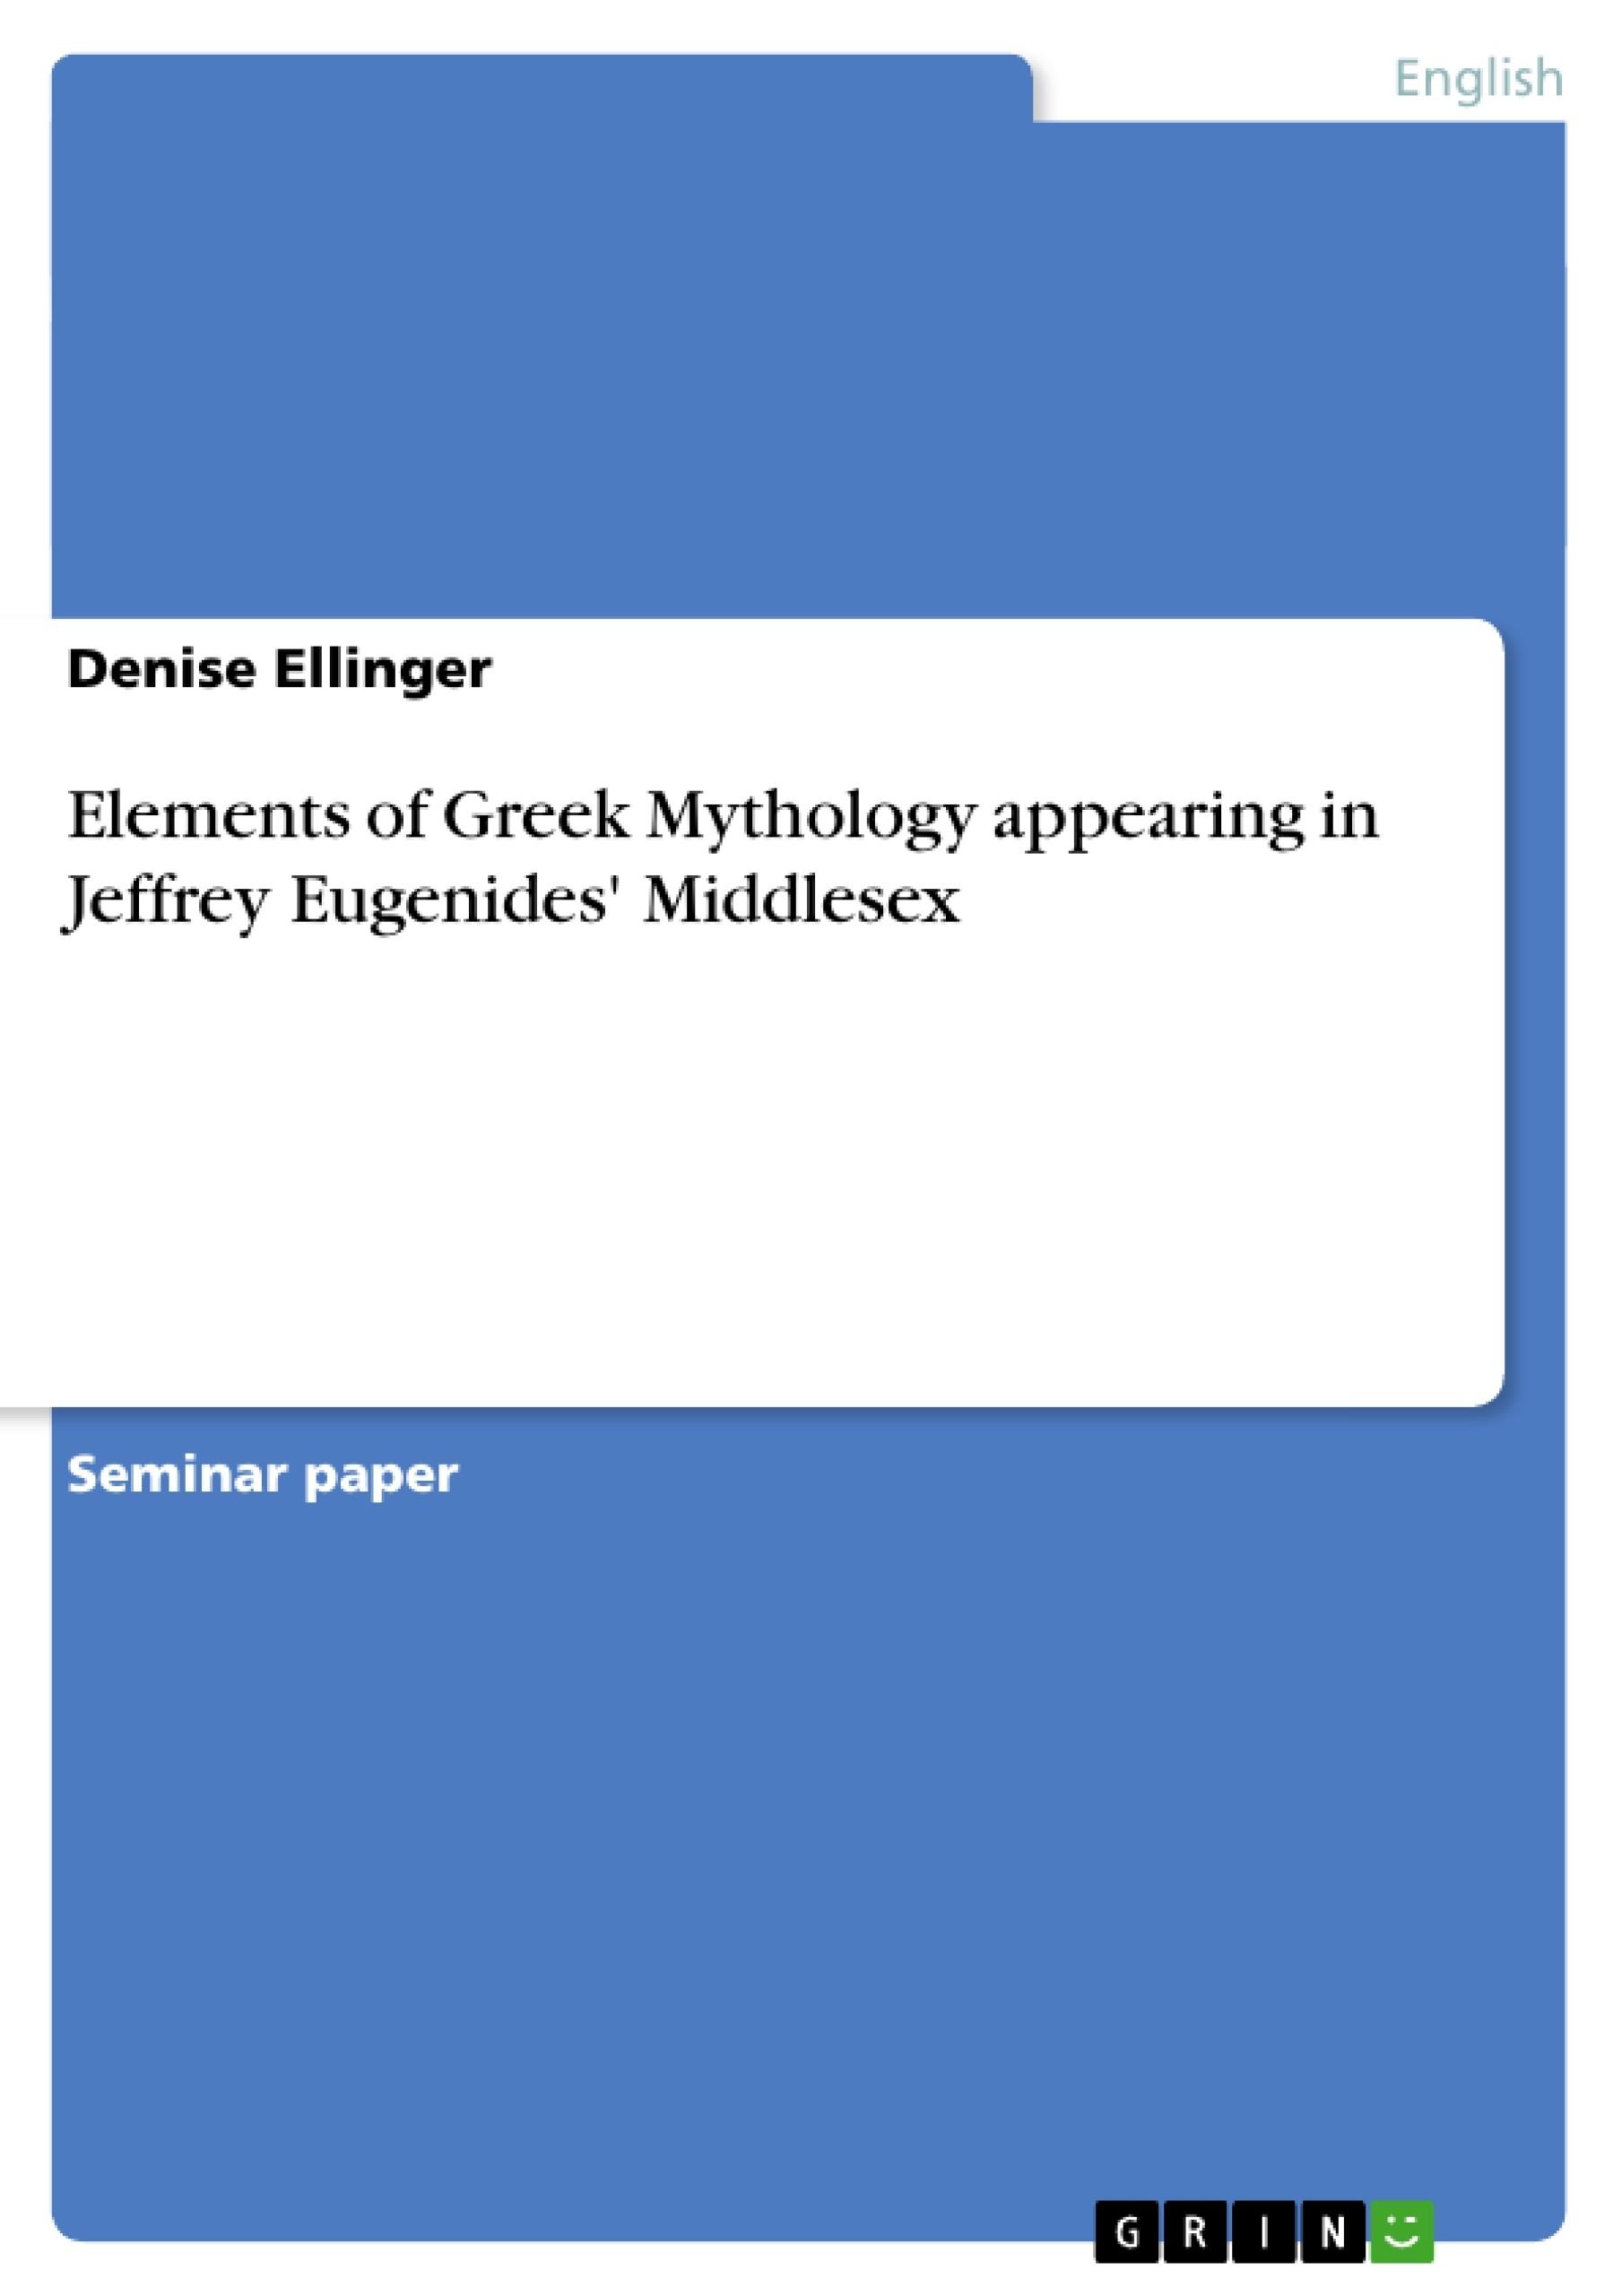 Title: Elements of Greek Mythology appearing in Jeffrey Eugenides' Middlesex